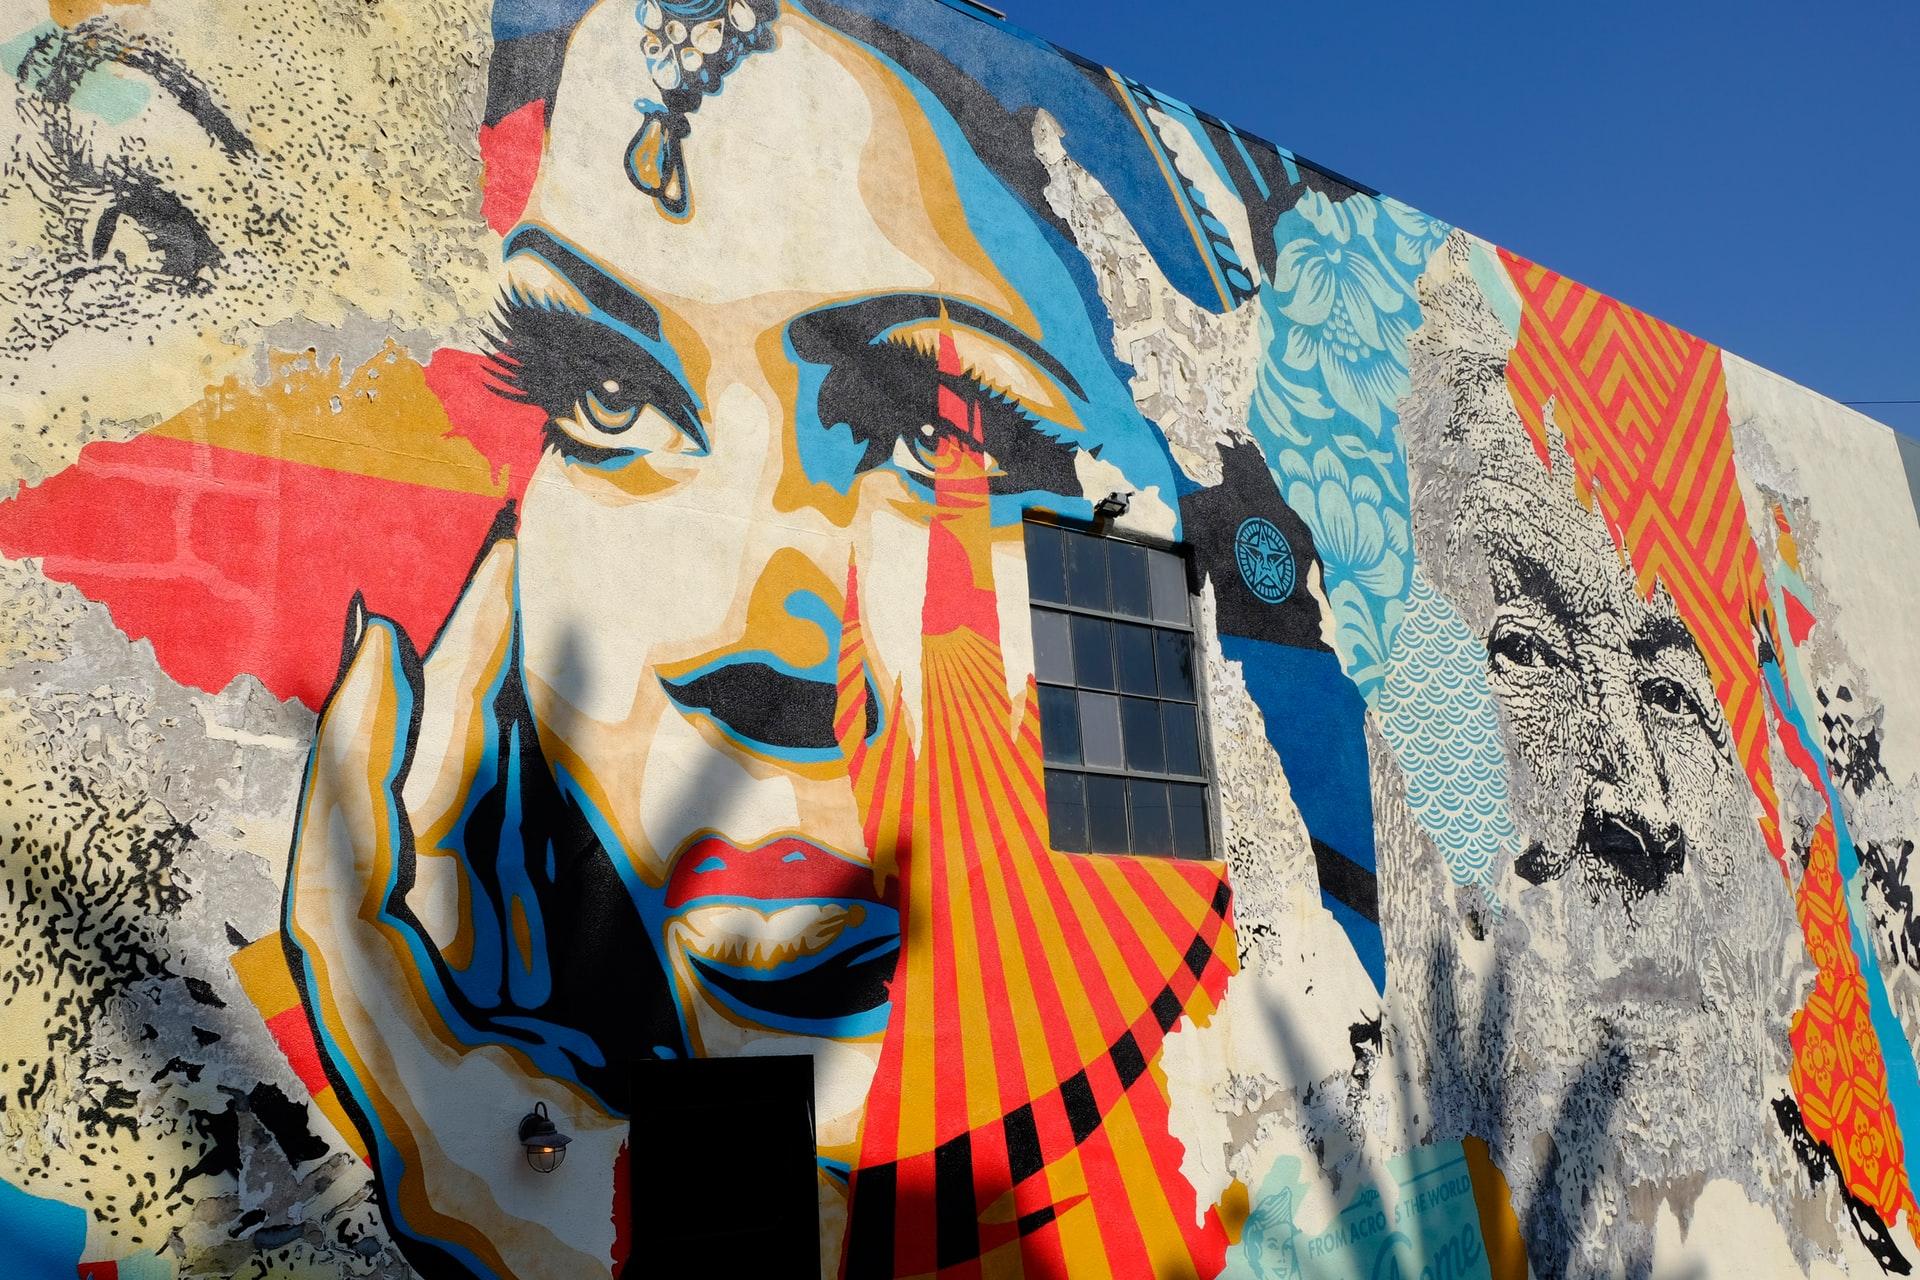 mural urbano pintado